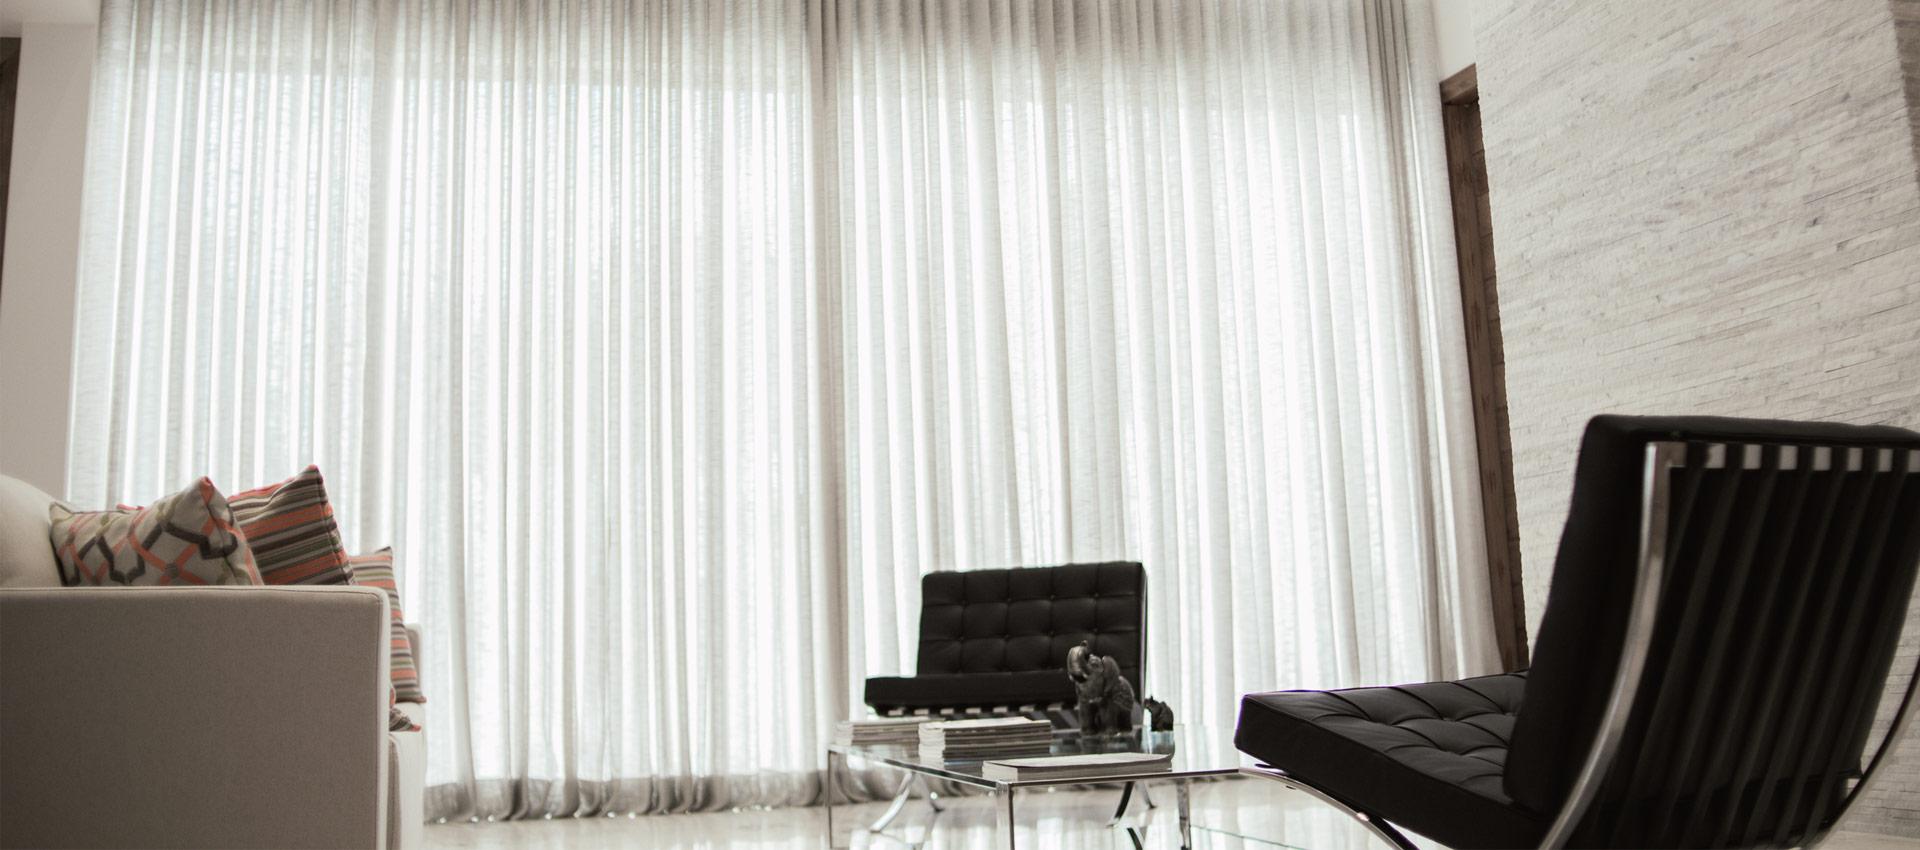 cortina-tecido-06